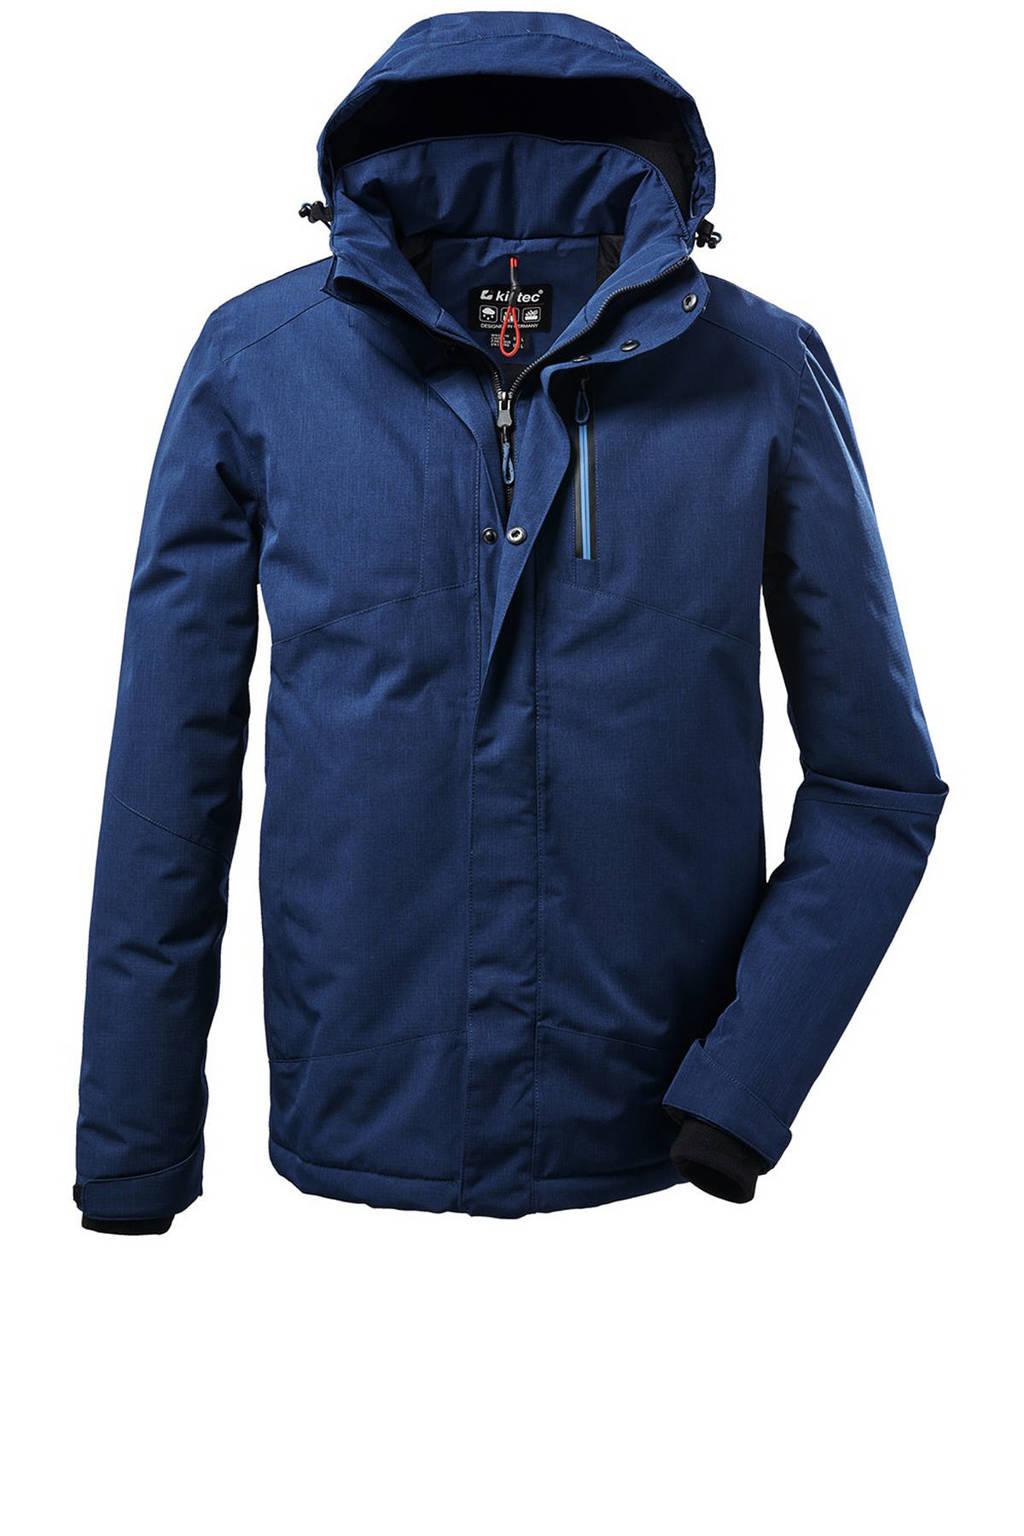 Killtec outdoor jas Kow 161 blauw, Blauw